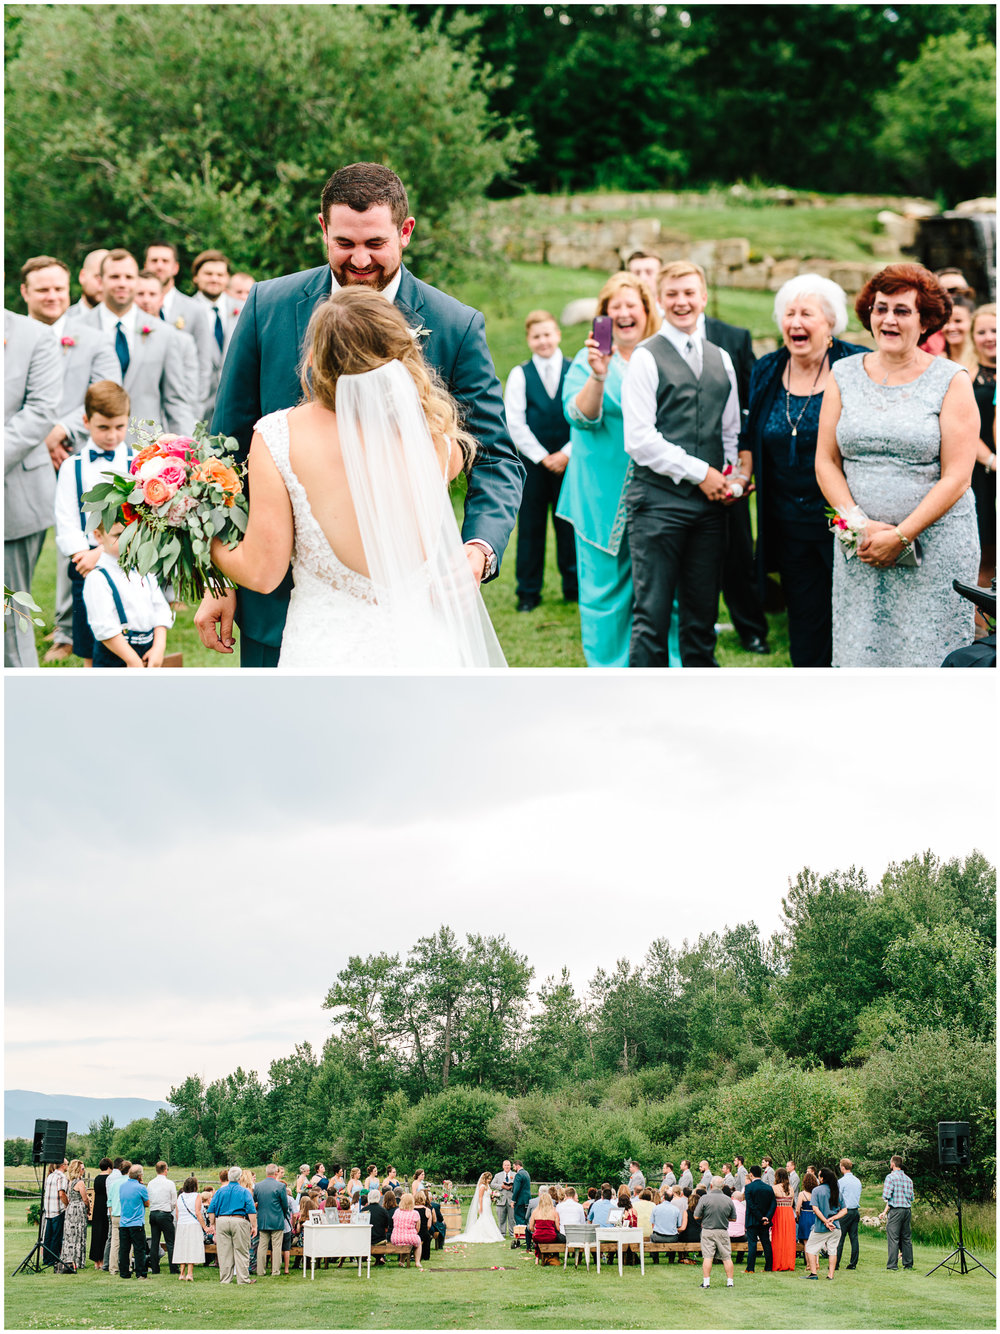 redlodge_montana_wedding_64.jpg